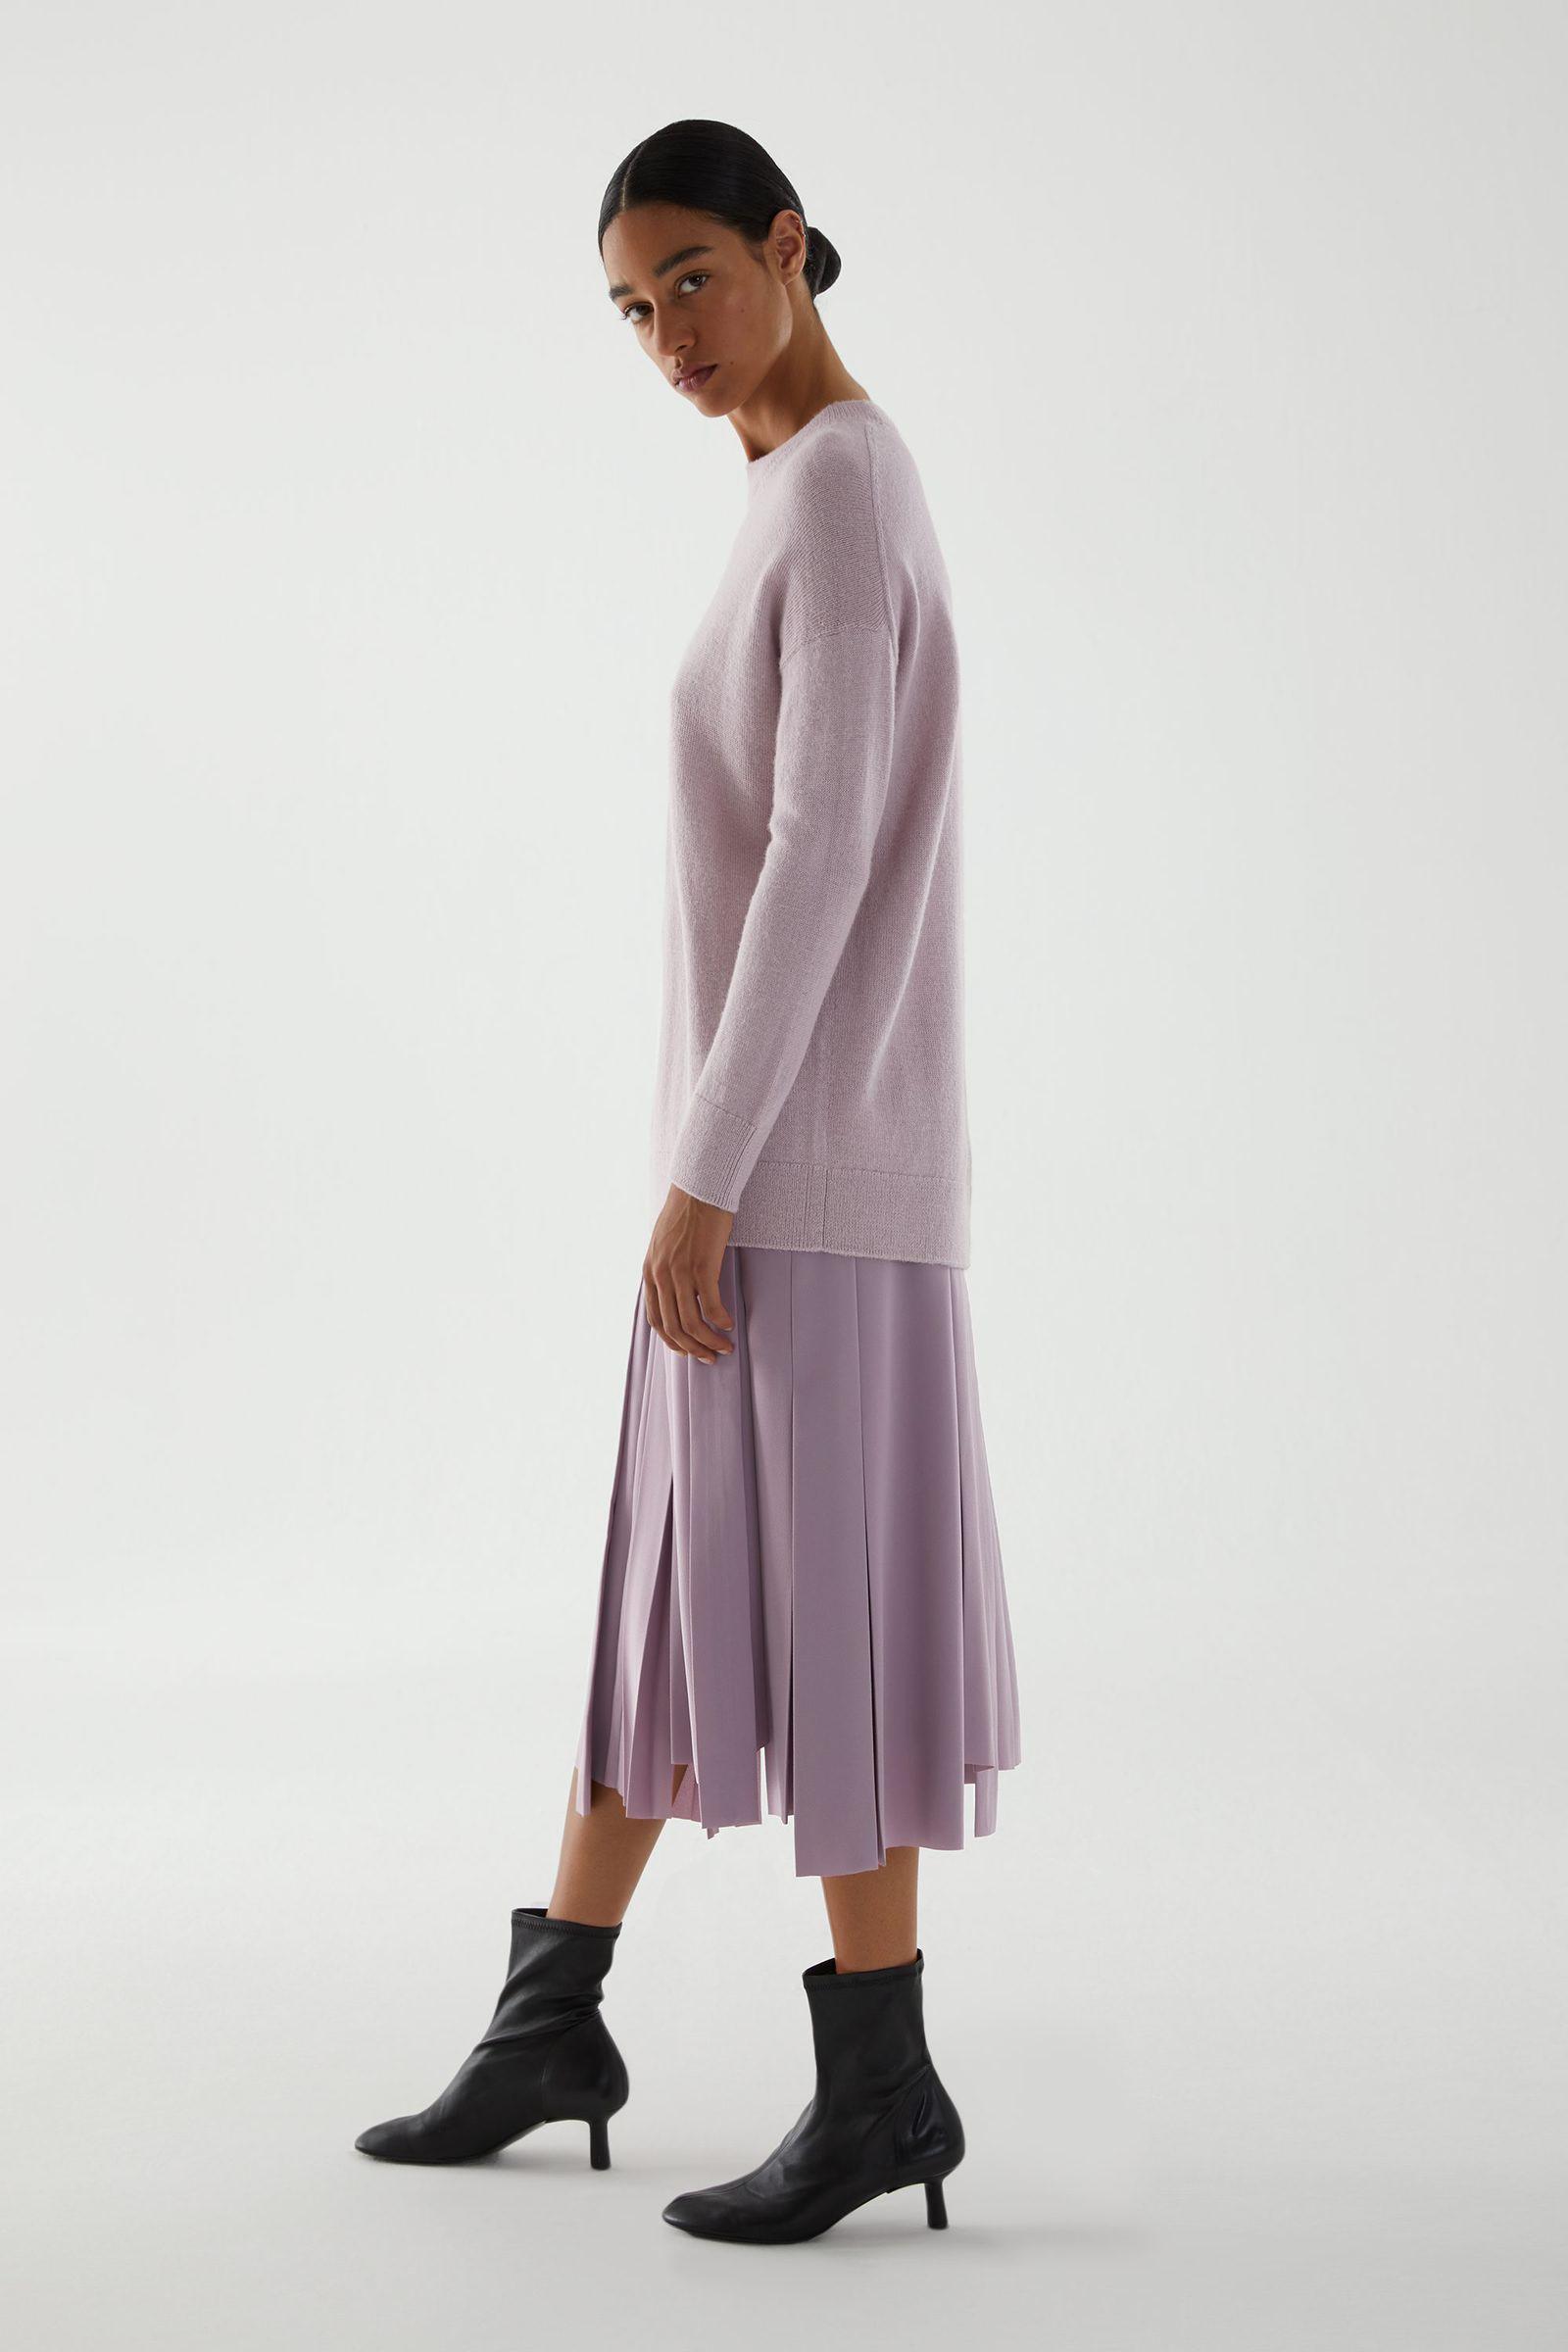 COS 알파카 플레인 니트 스웨터의 핑크컬러 ECOMLook입니다.